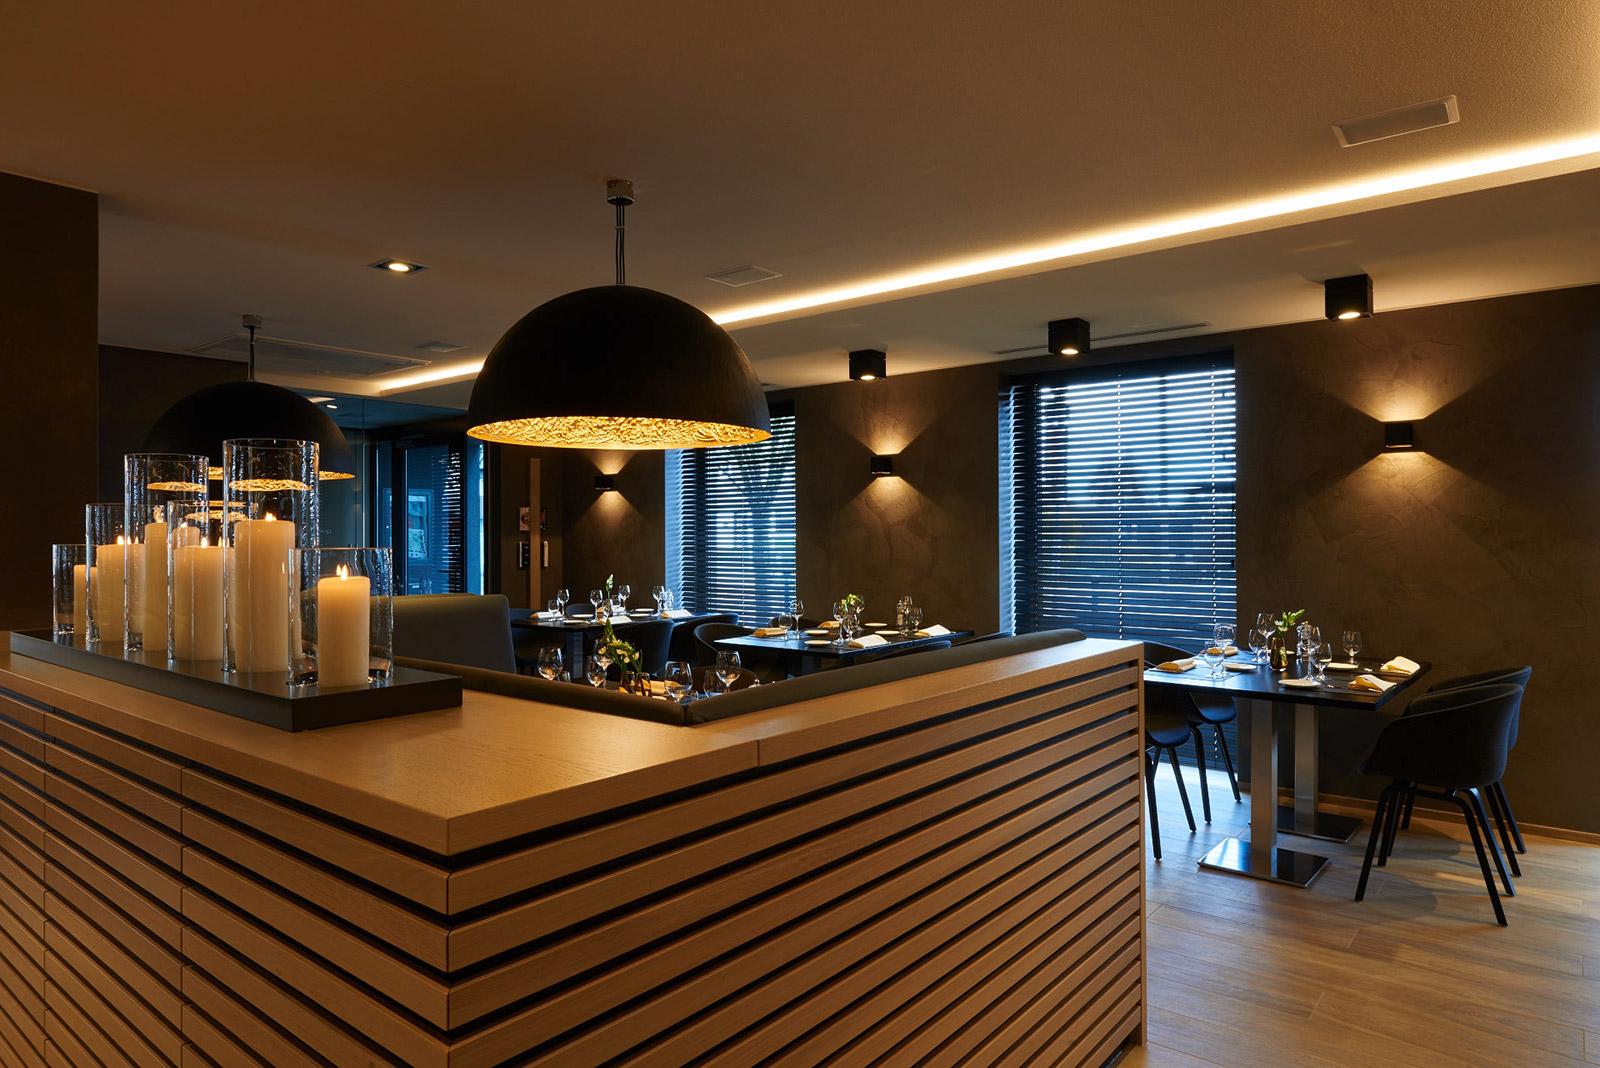 Küchen Sankt Vith ~ brasserie restaurant quadras u2013 st vith